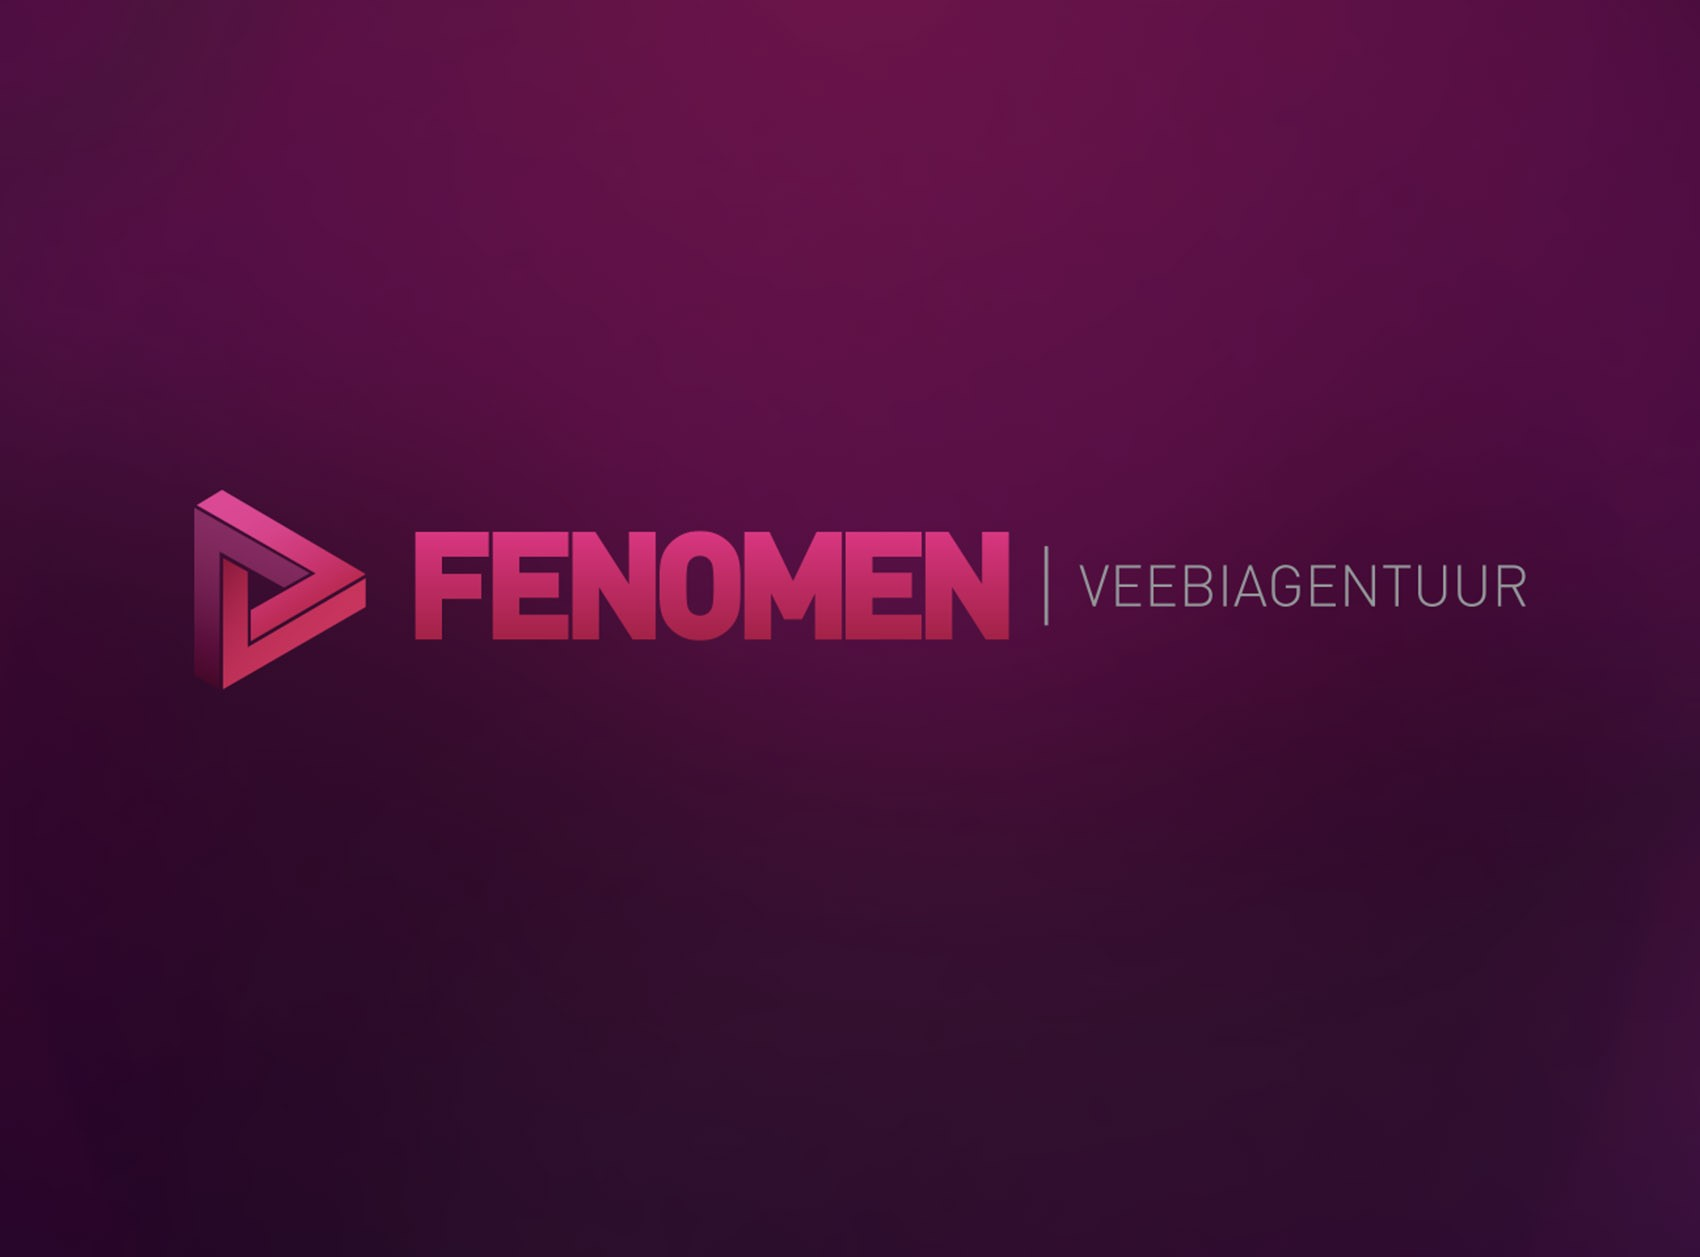 Logodisain: Fenomen veebiagentuur